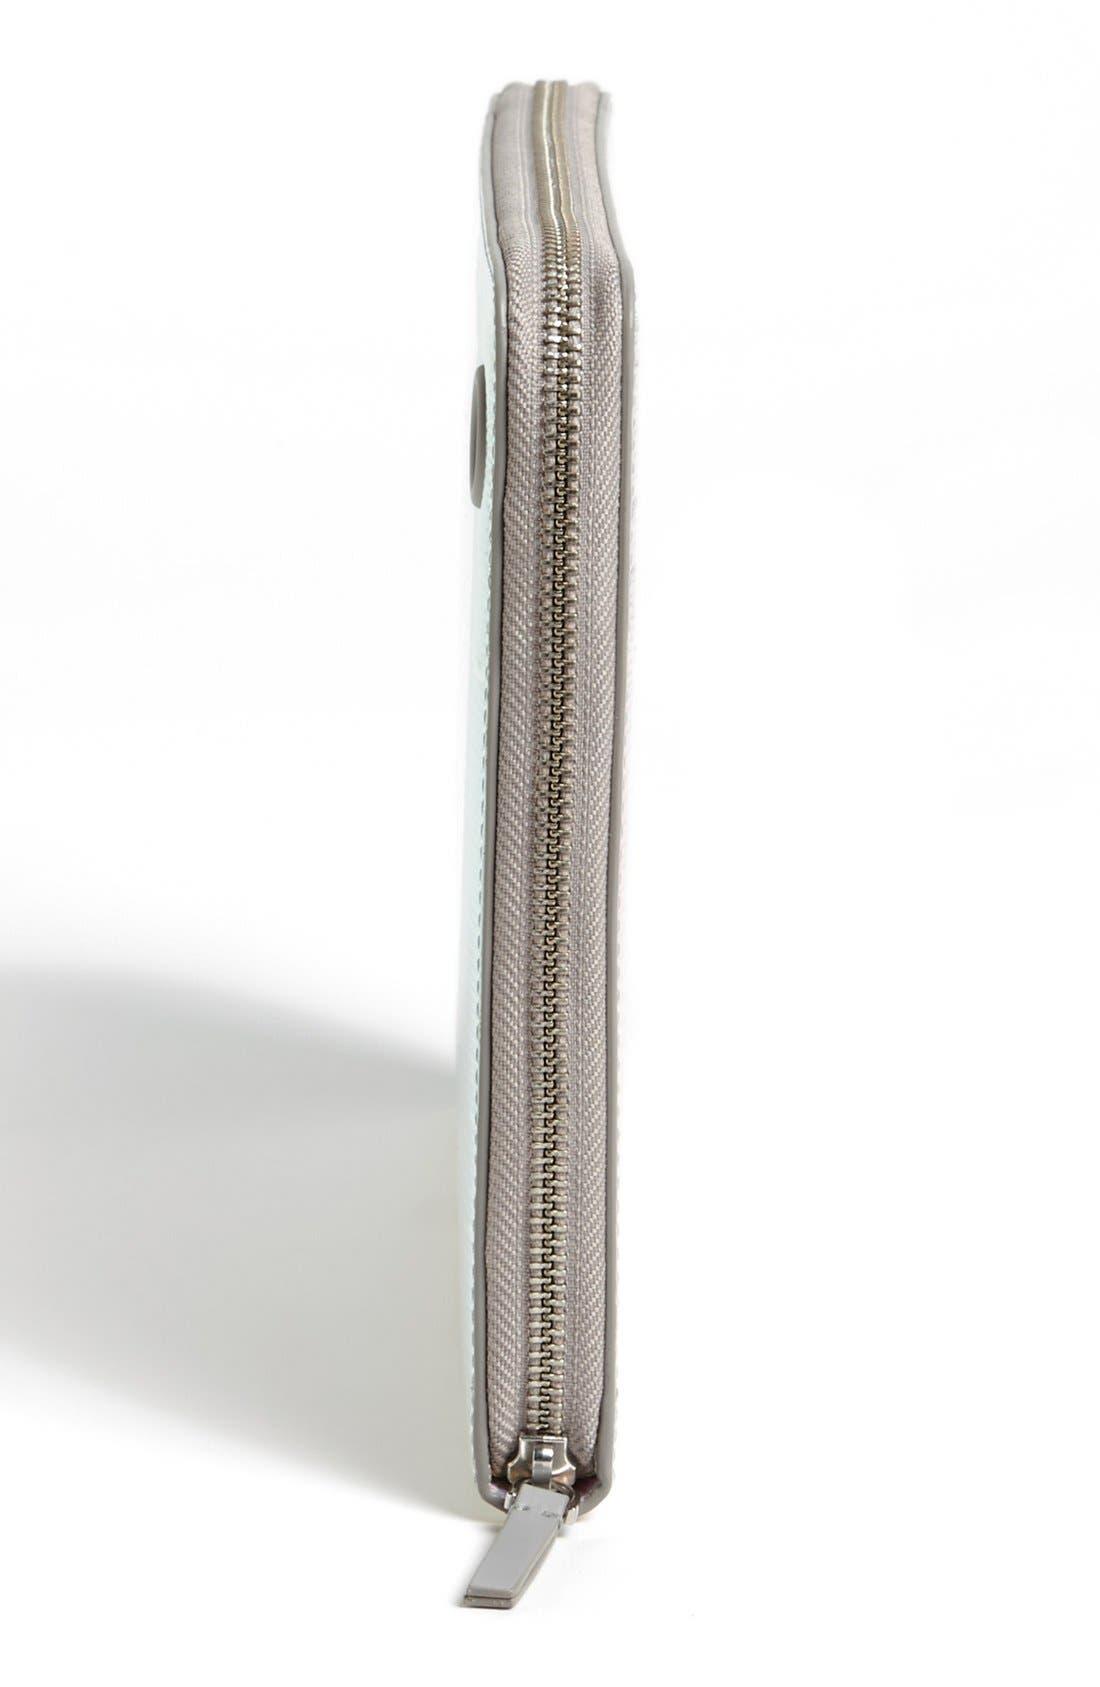 MARC JACOBS,                             MARC BY MARC JACOBS 'Chameleon' iPad 3 & 4 Case,                             Alternate thumbnail 2, color,                             040